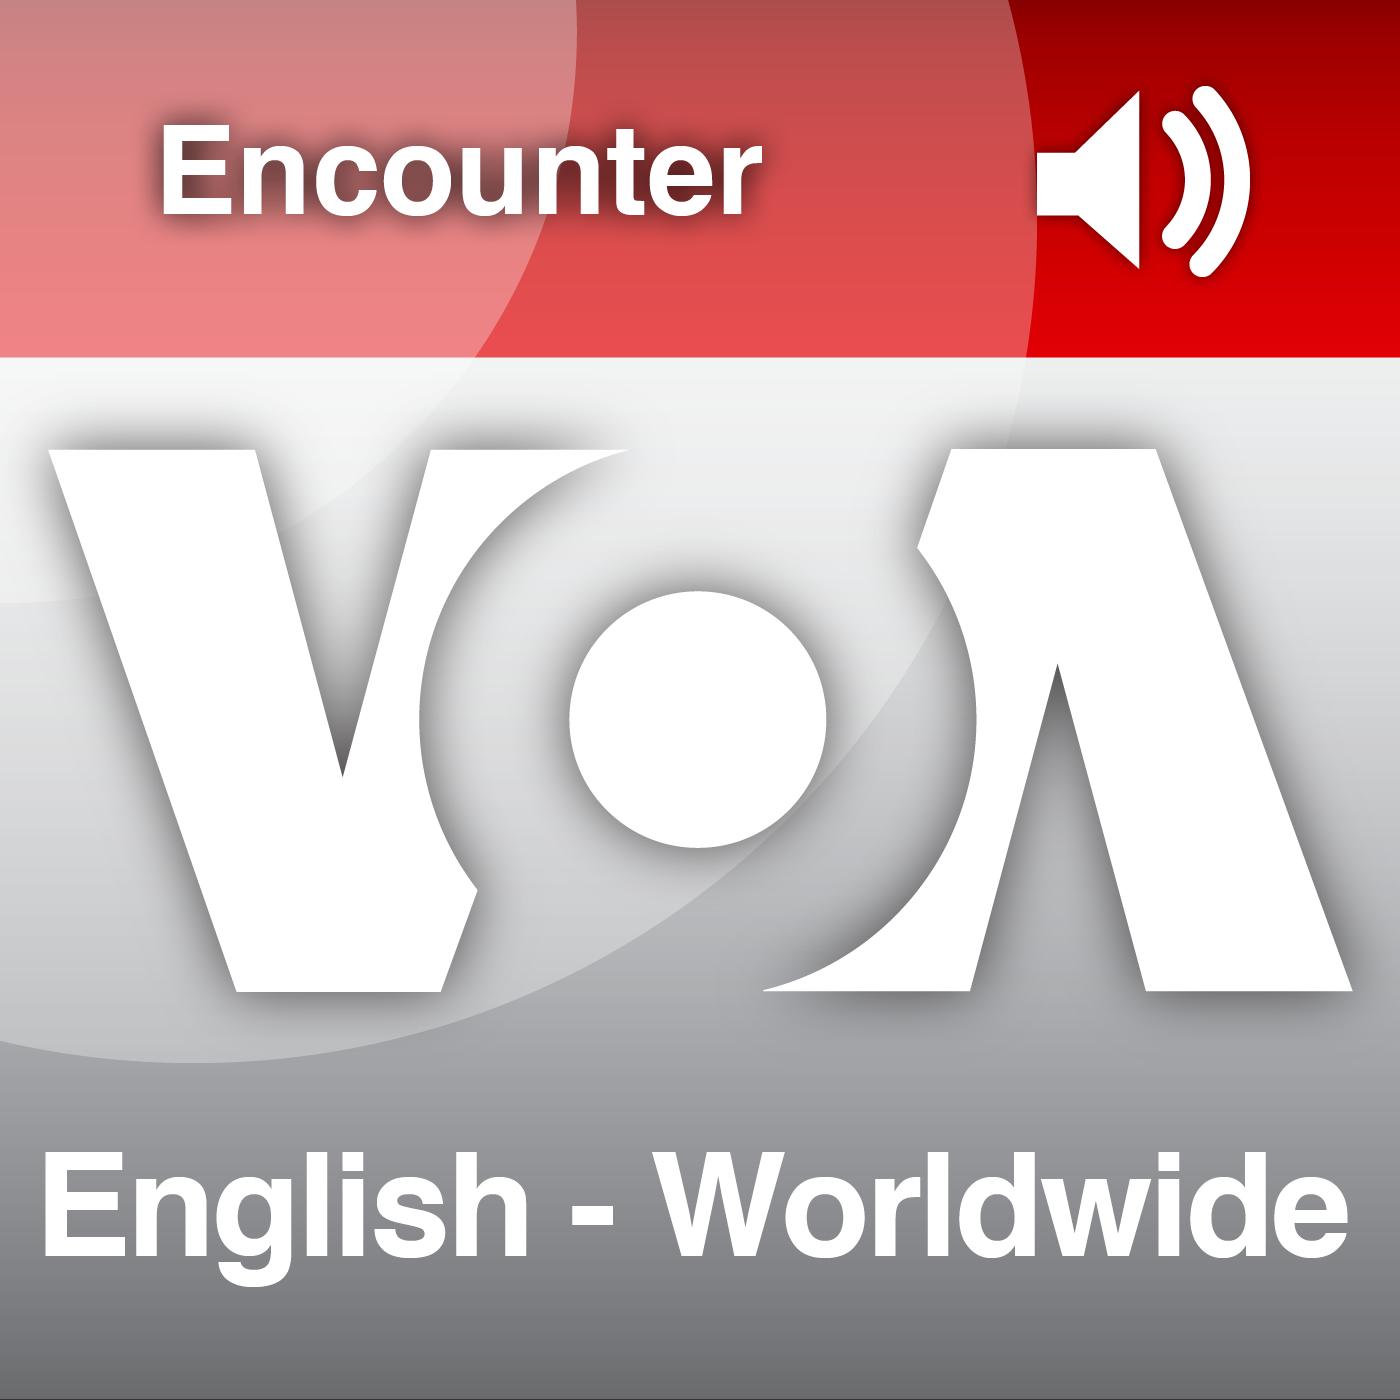 Encounter  - Voice of America